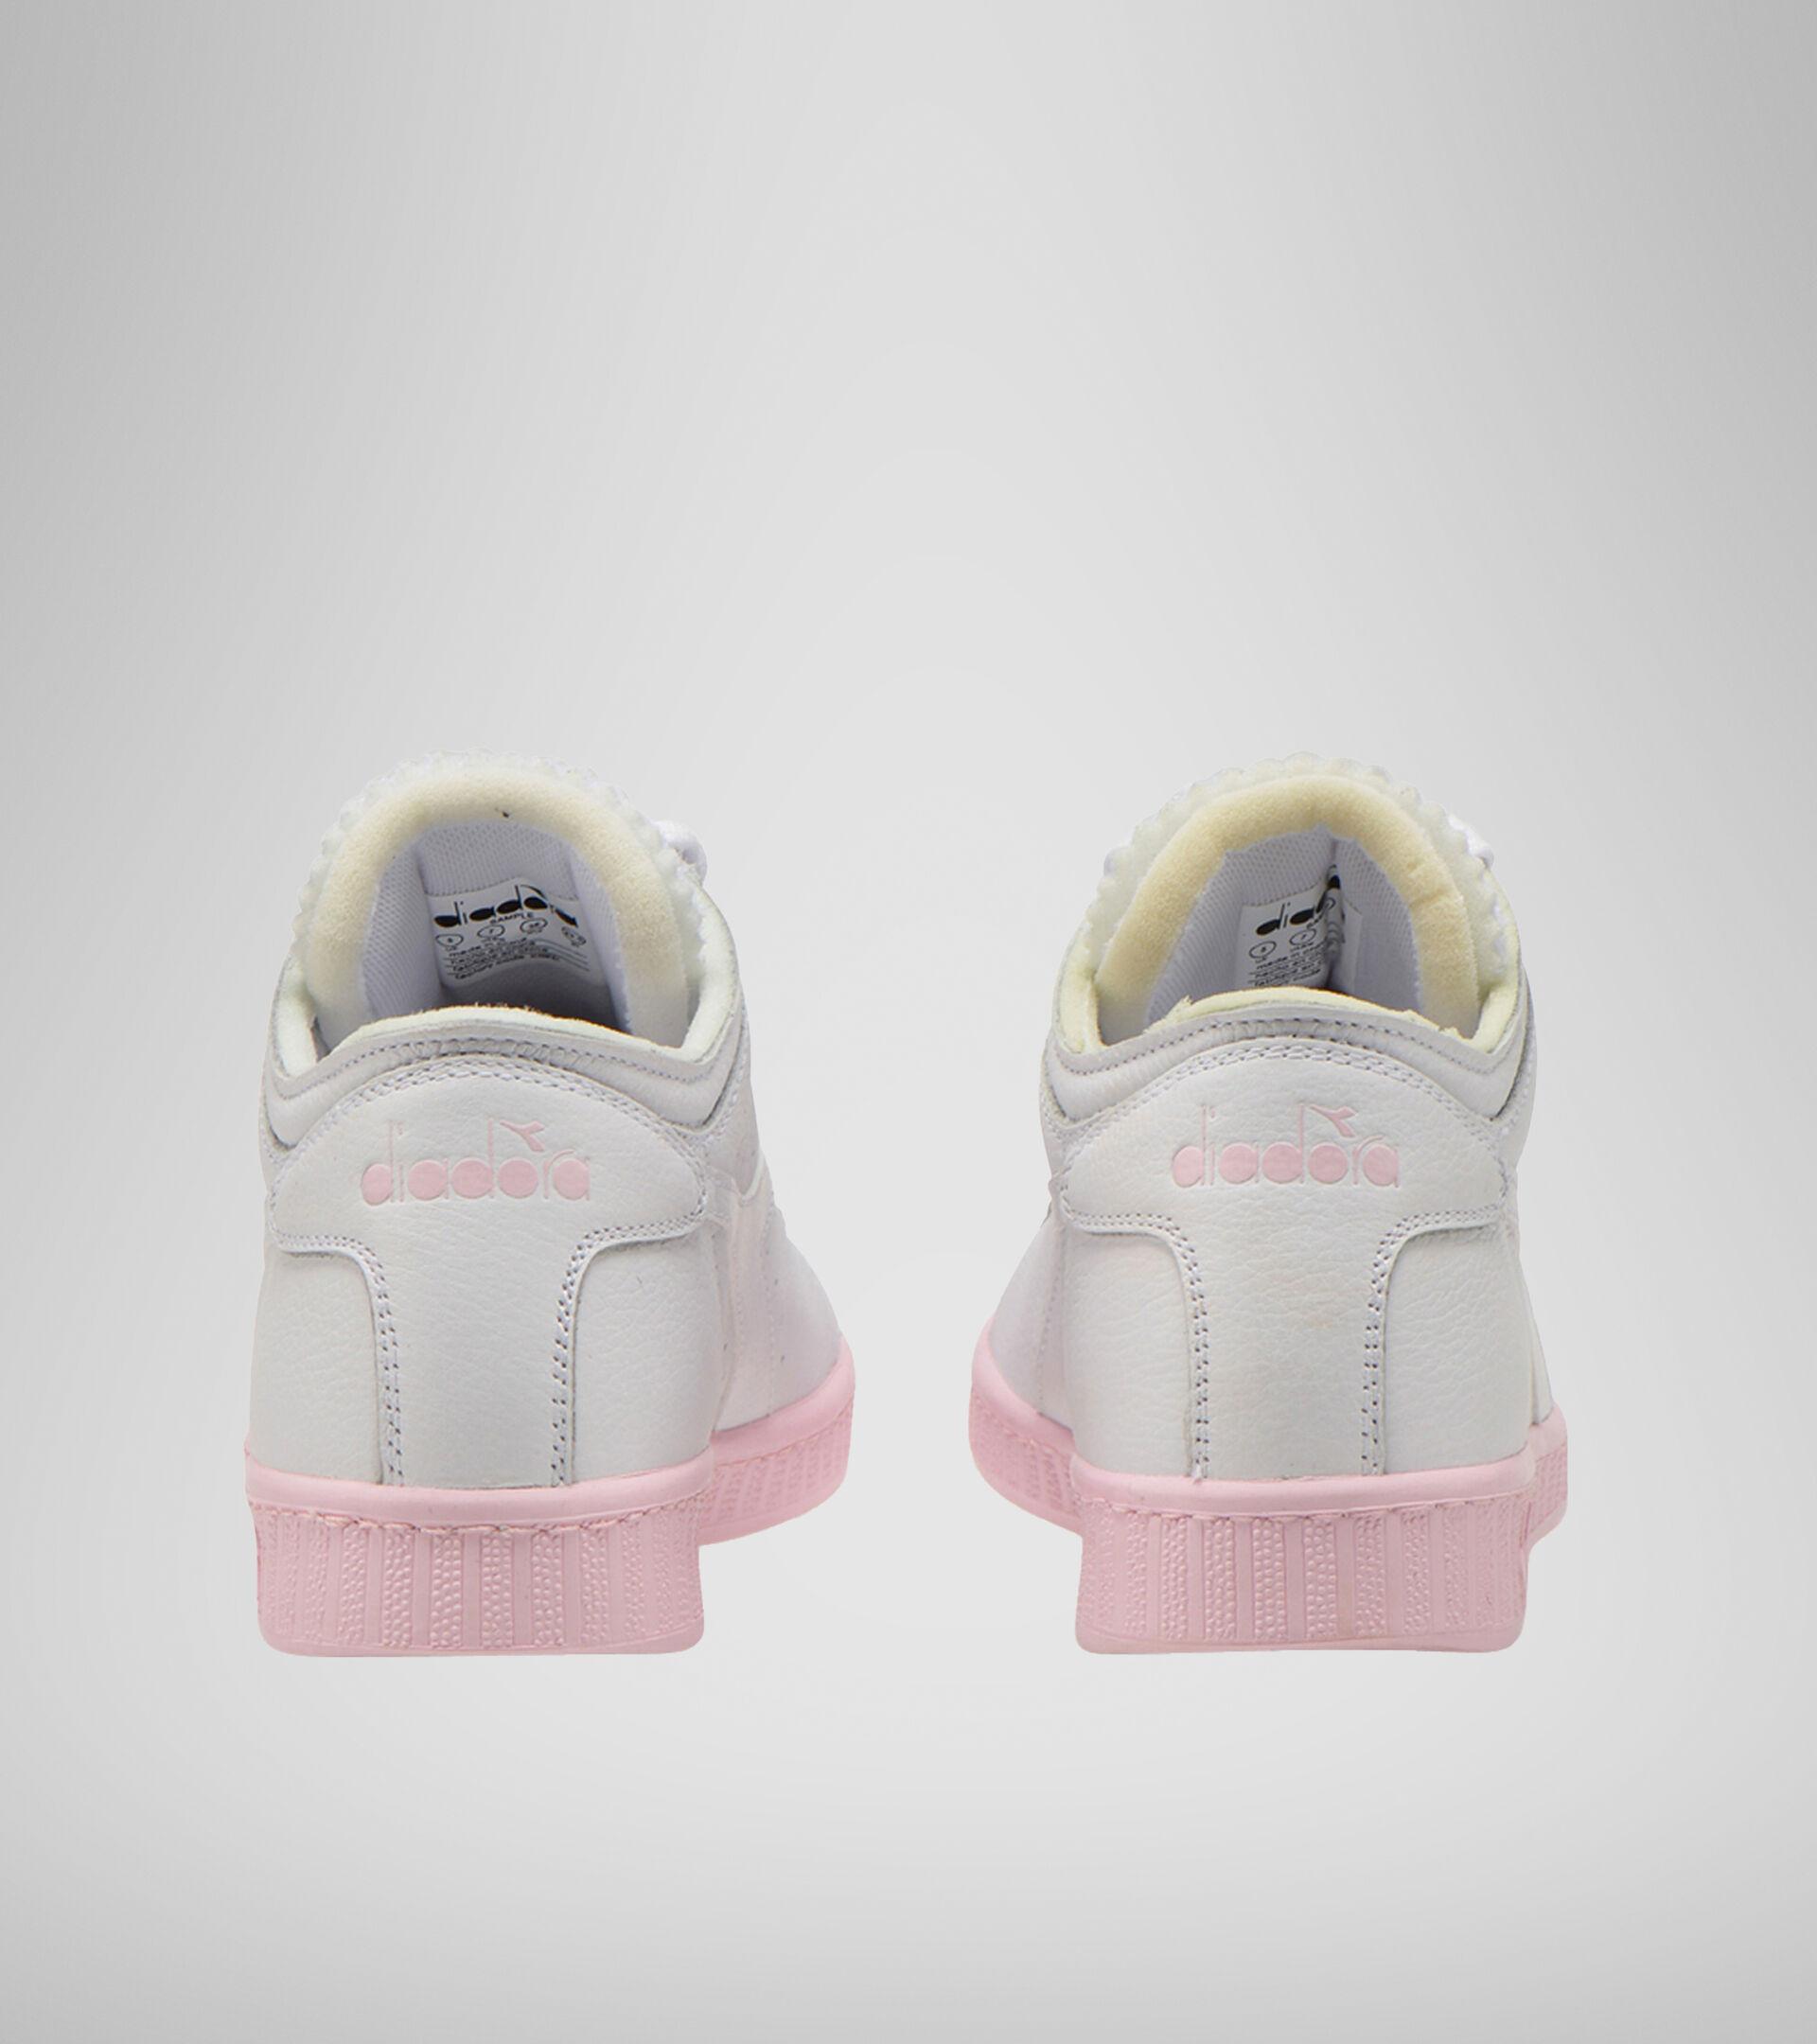 Footwear Sportswear DONNA GAME L ROW CUT SOLE BLOCK WN SUPER WHITE/PARFAIT PINK Diadora